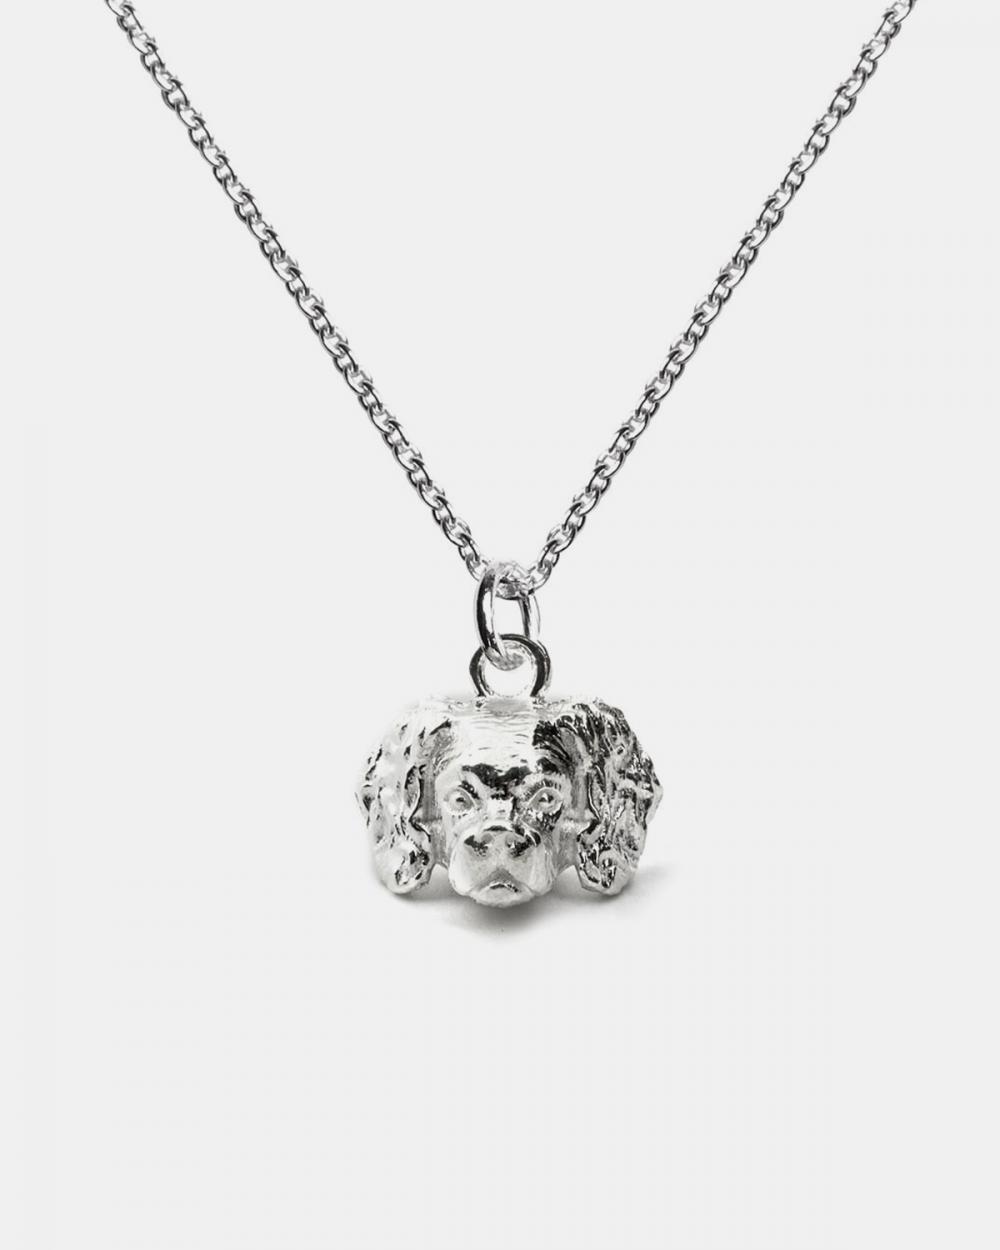 Necklaces CAVALIER KING PENDANT NECKLACE F040 L60 / POLISHED SILVER NOVE25